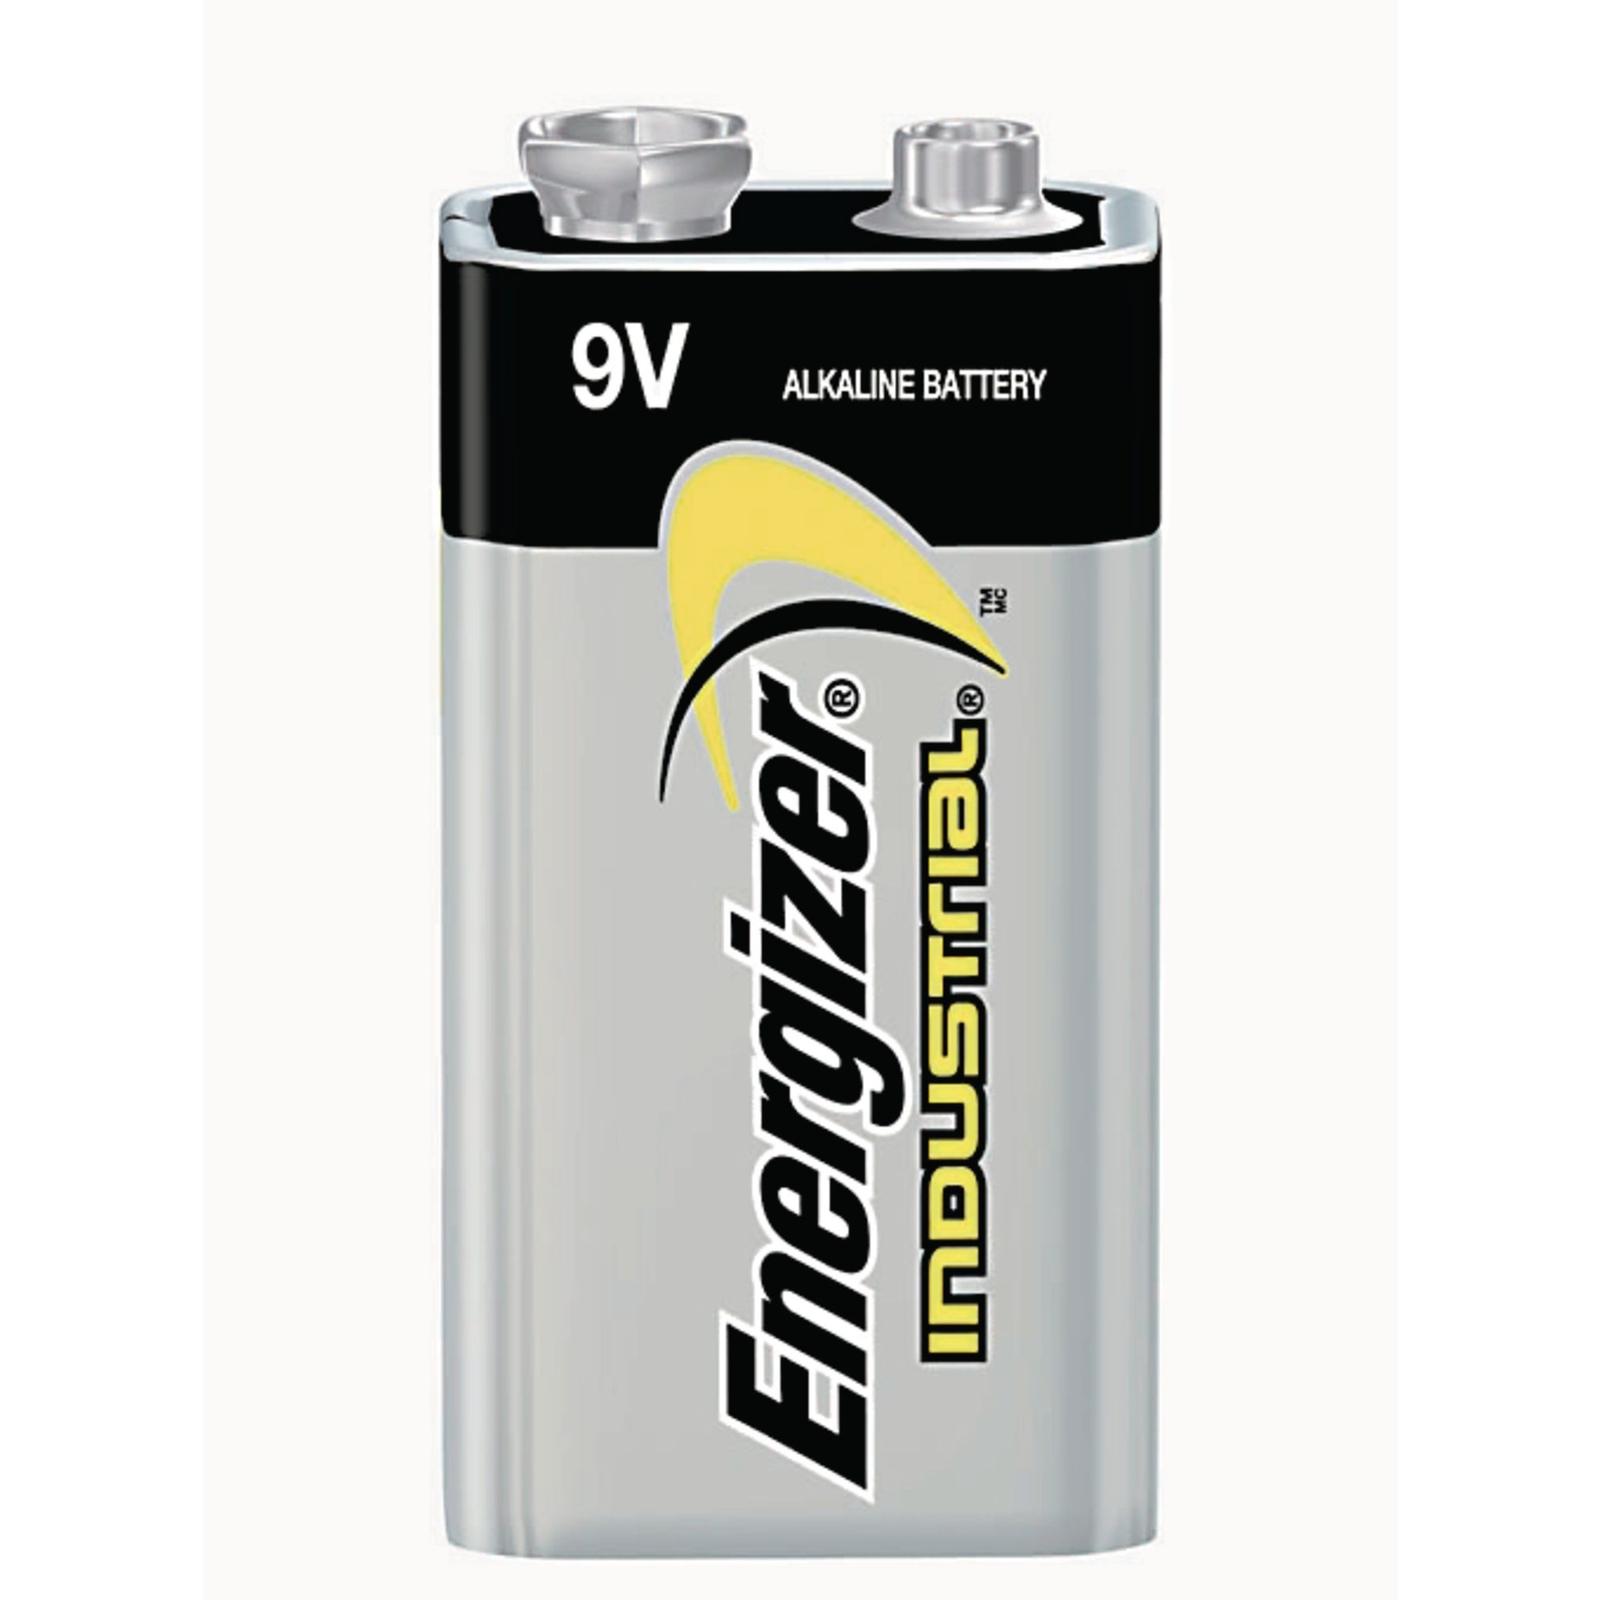 General Purpose Battery - 9V, 6LR61